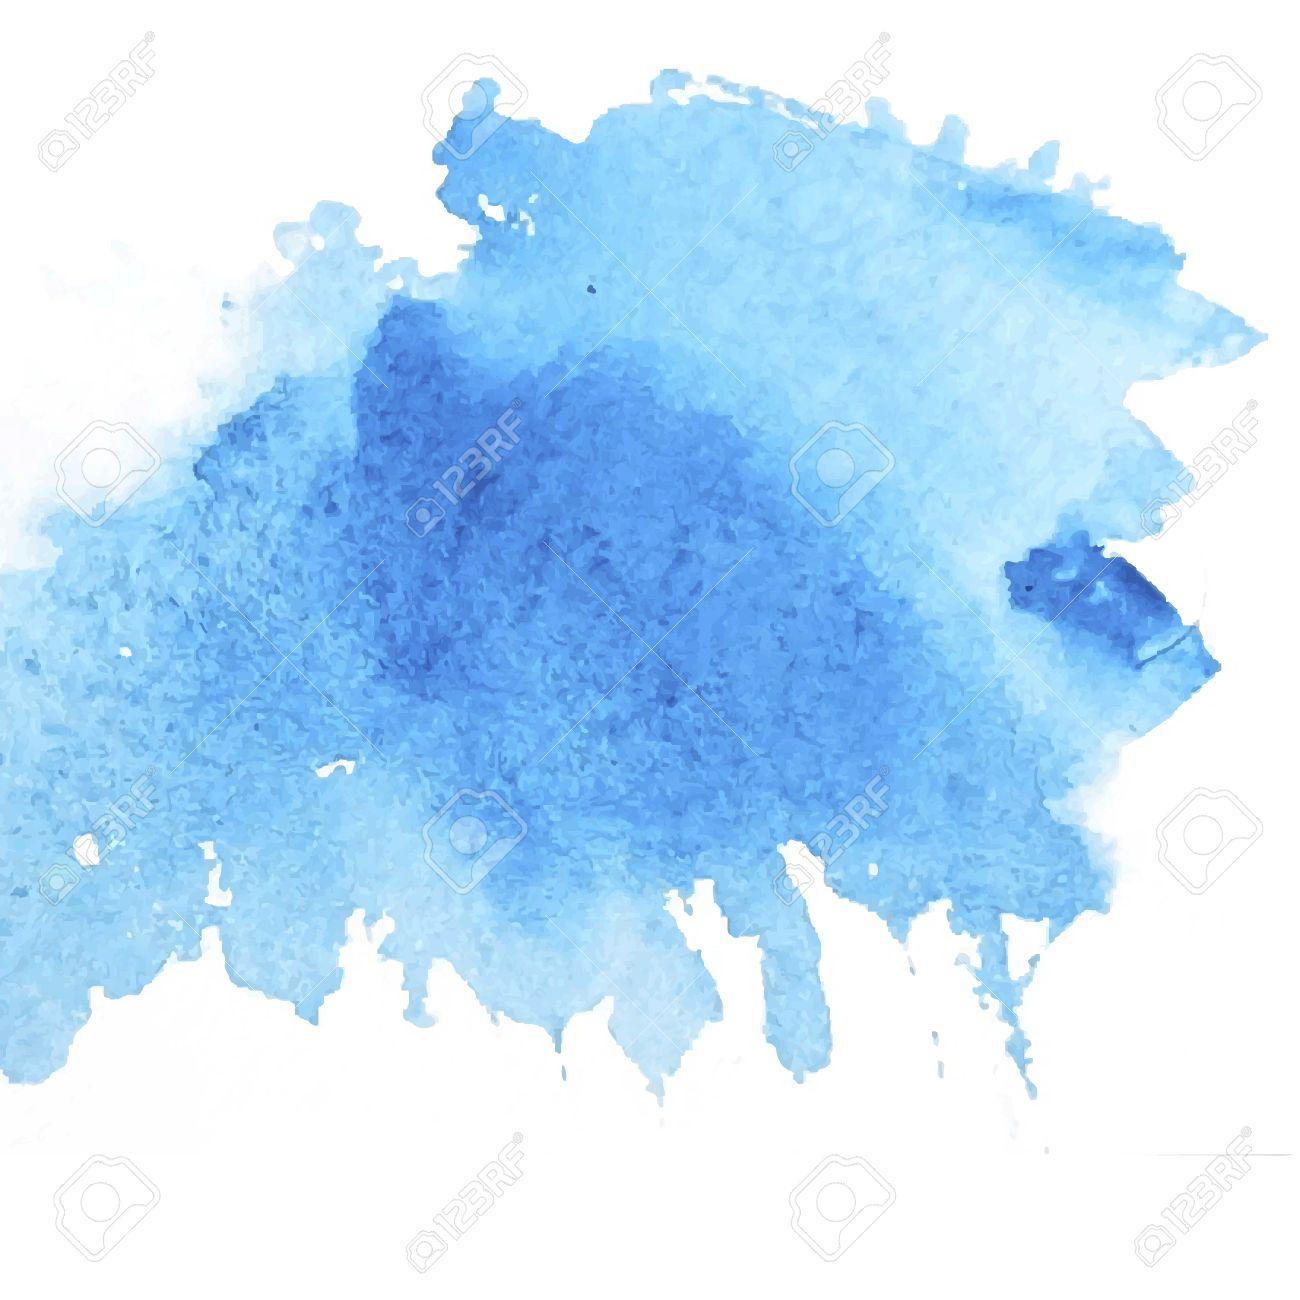 Light water blue watercolor banner for web design. Vector illustration. - 39520531